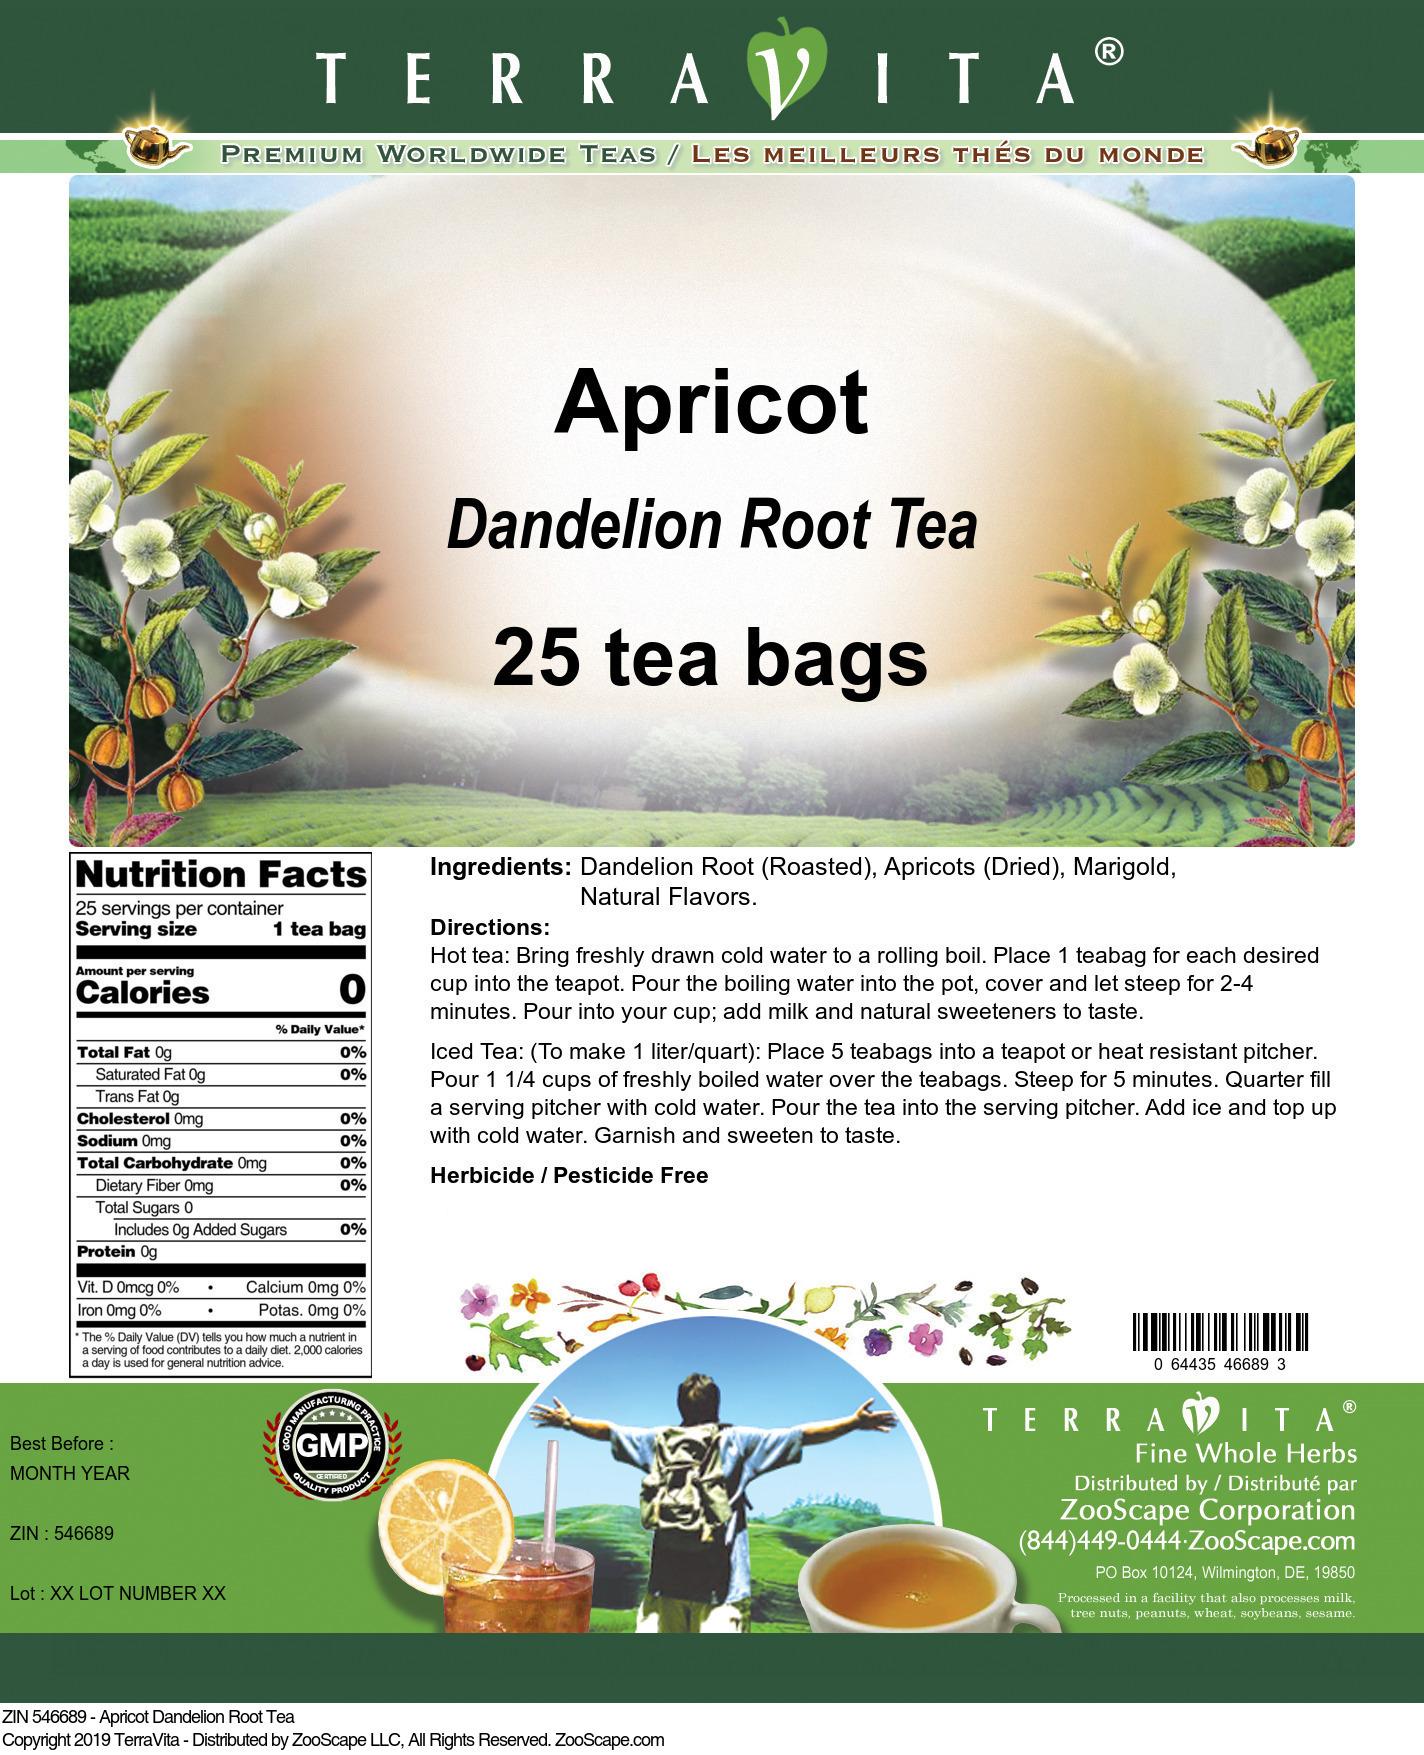 Apricot Dandelion Root